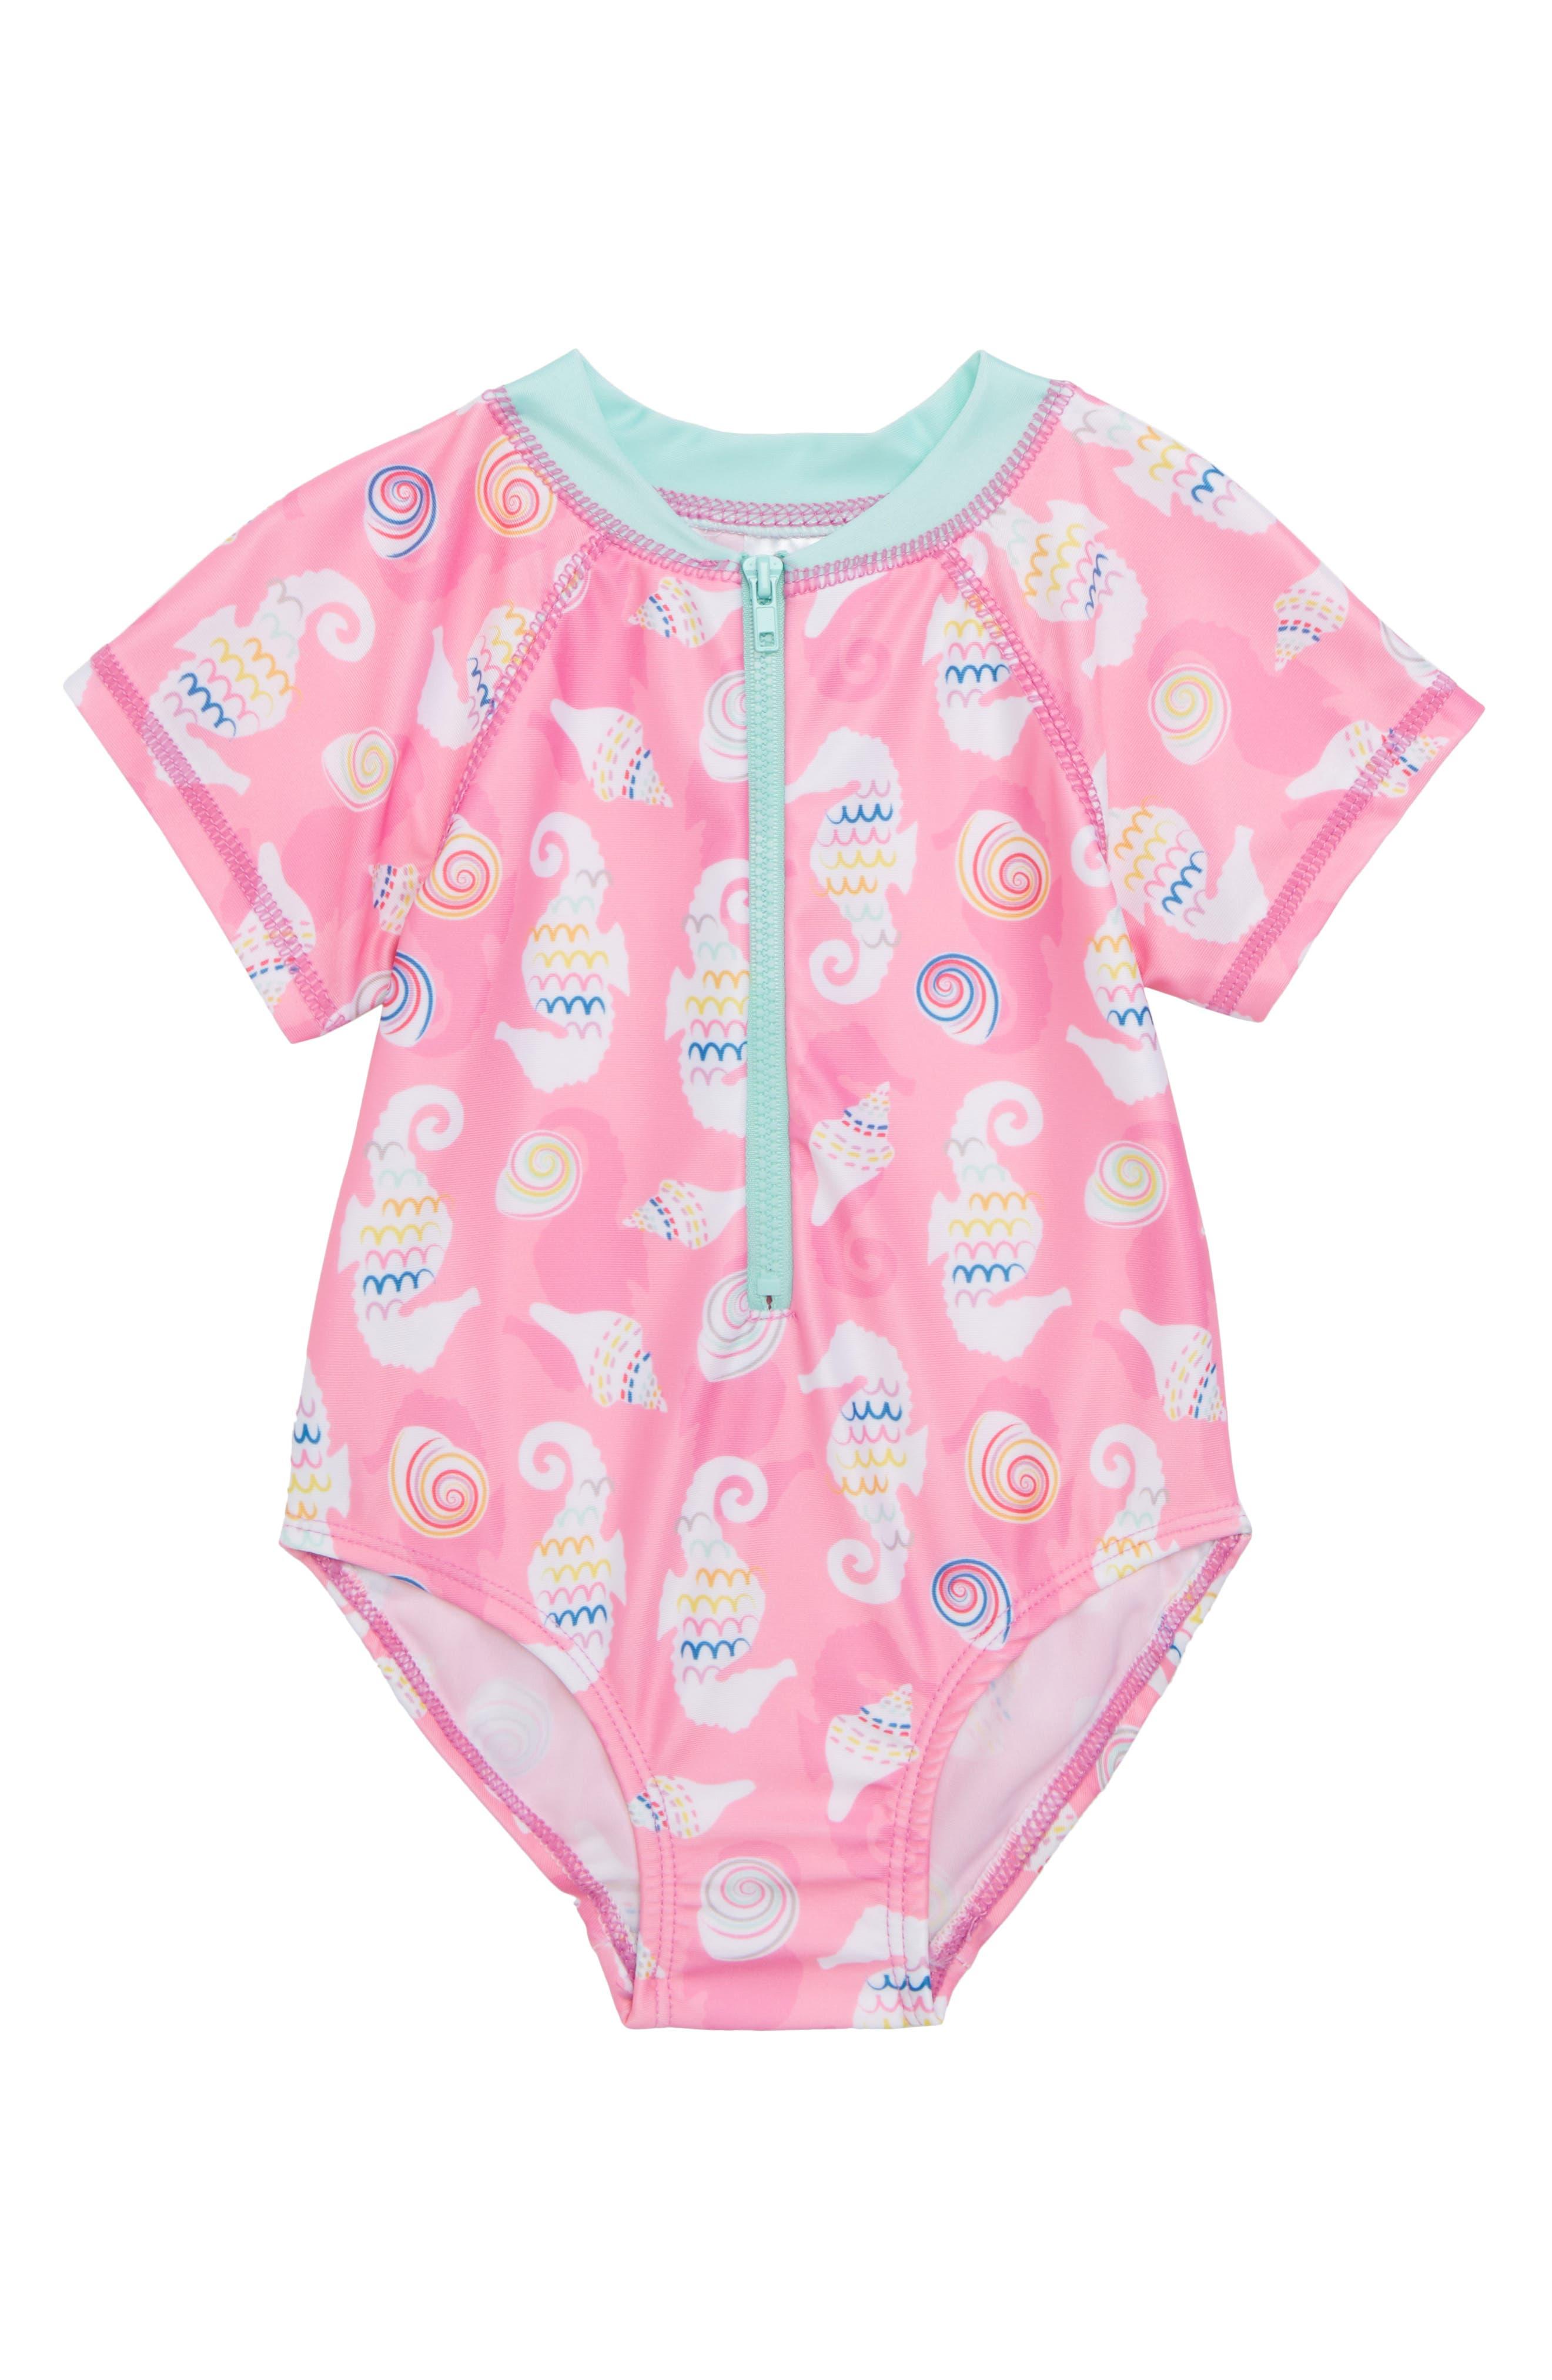 Seahorse/Shells One-Piece Short Sleeve Rashguard Swimsuit,                         Main,                         color, Pink